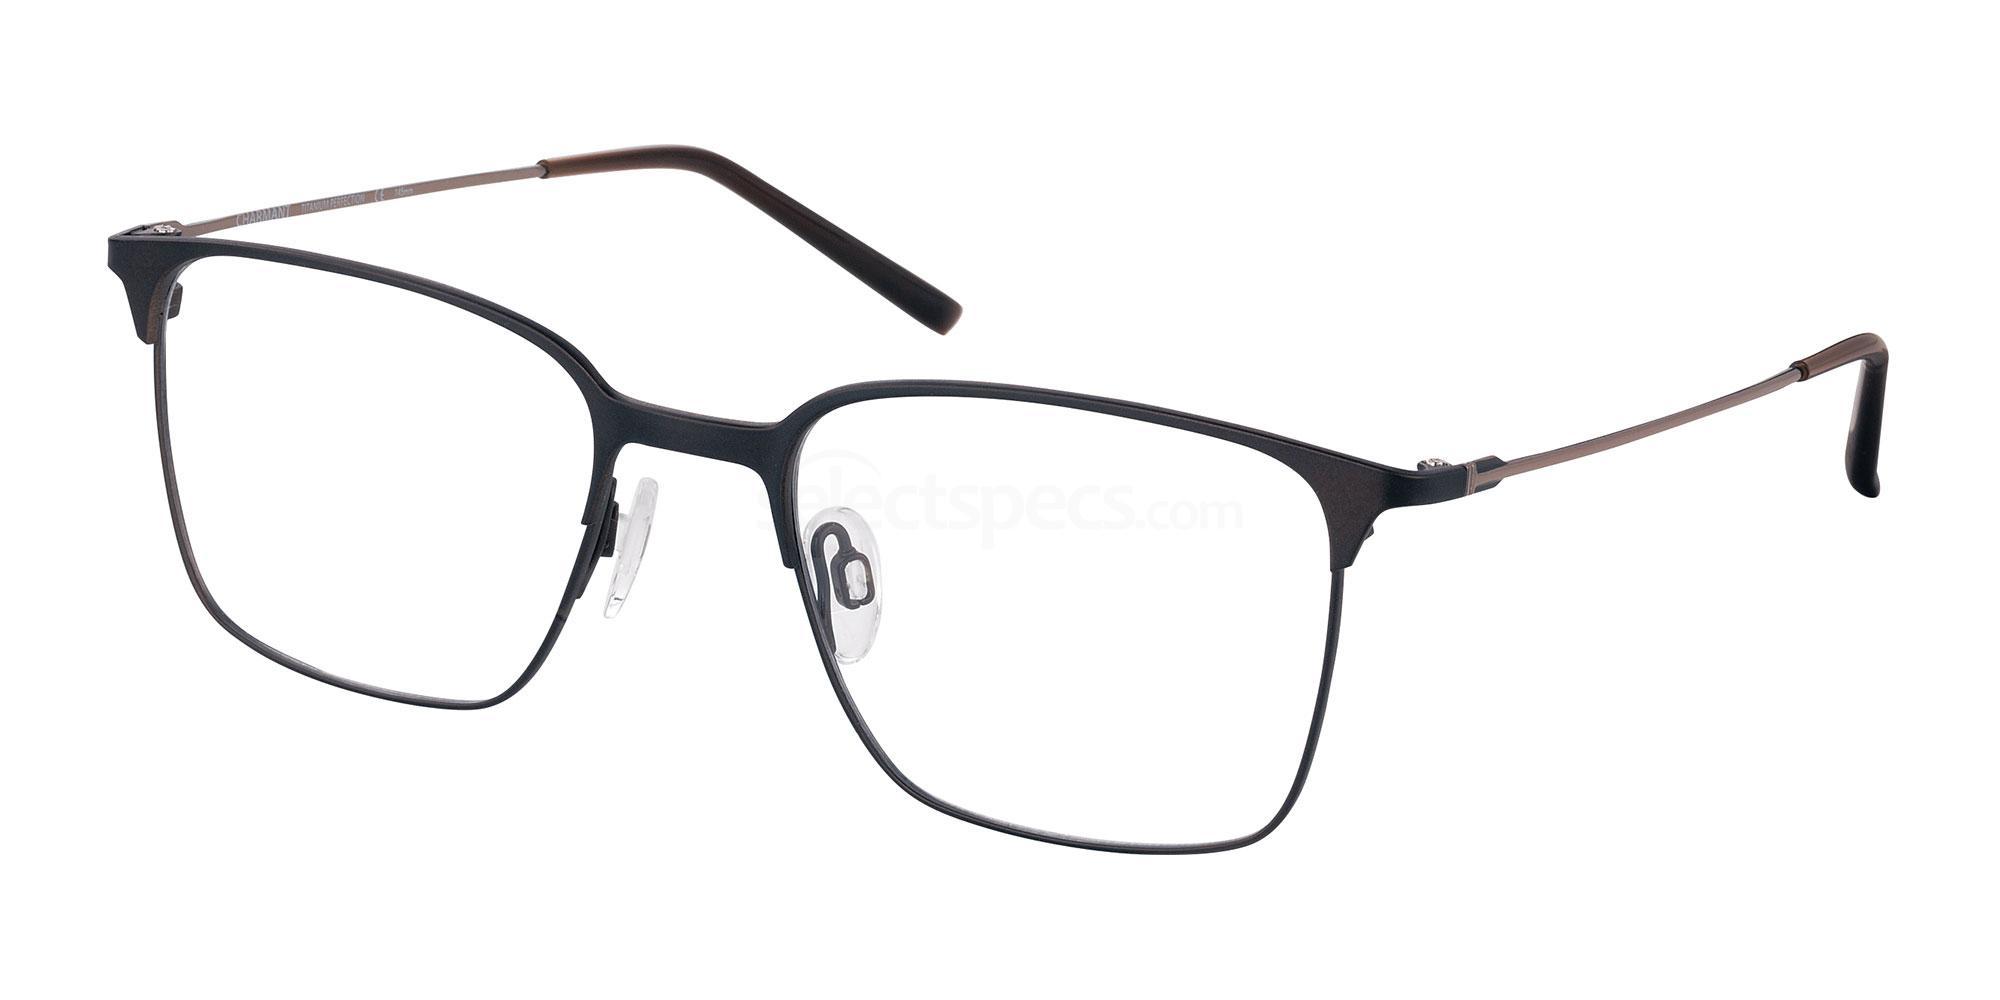 BR CH29709 Glasses, Charmant Titanium Perfection